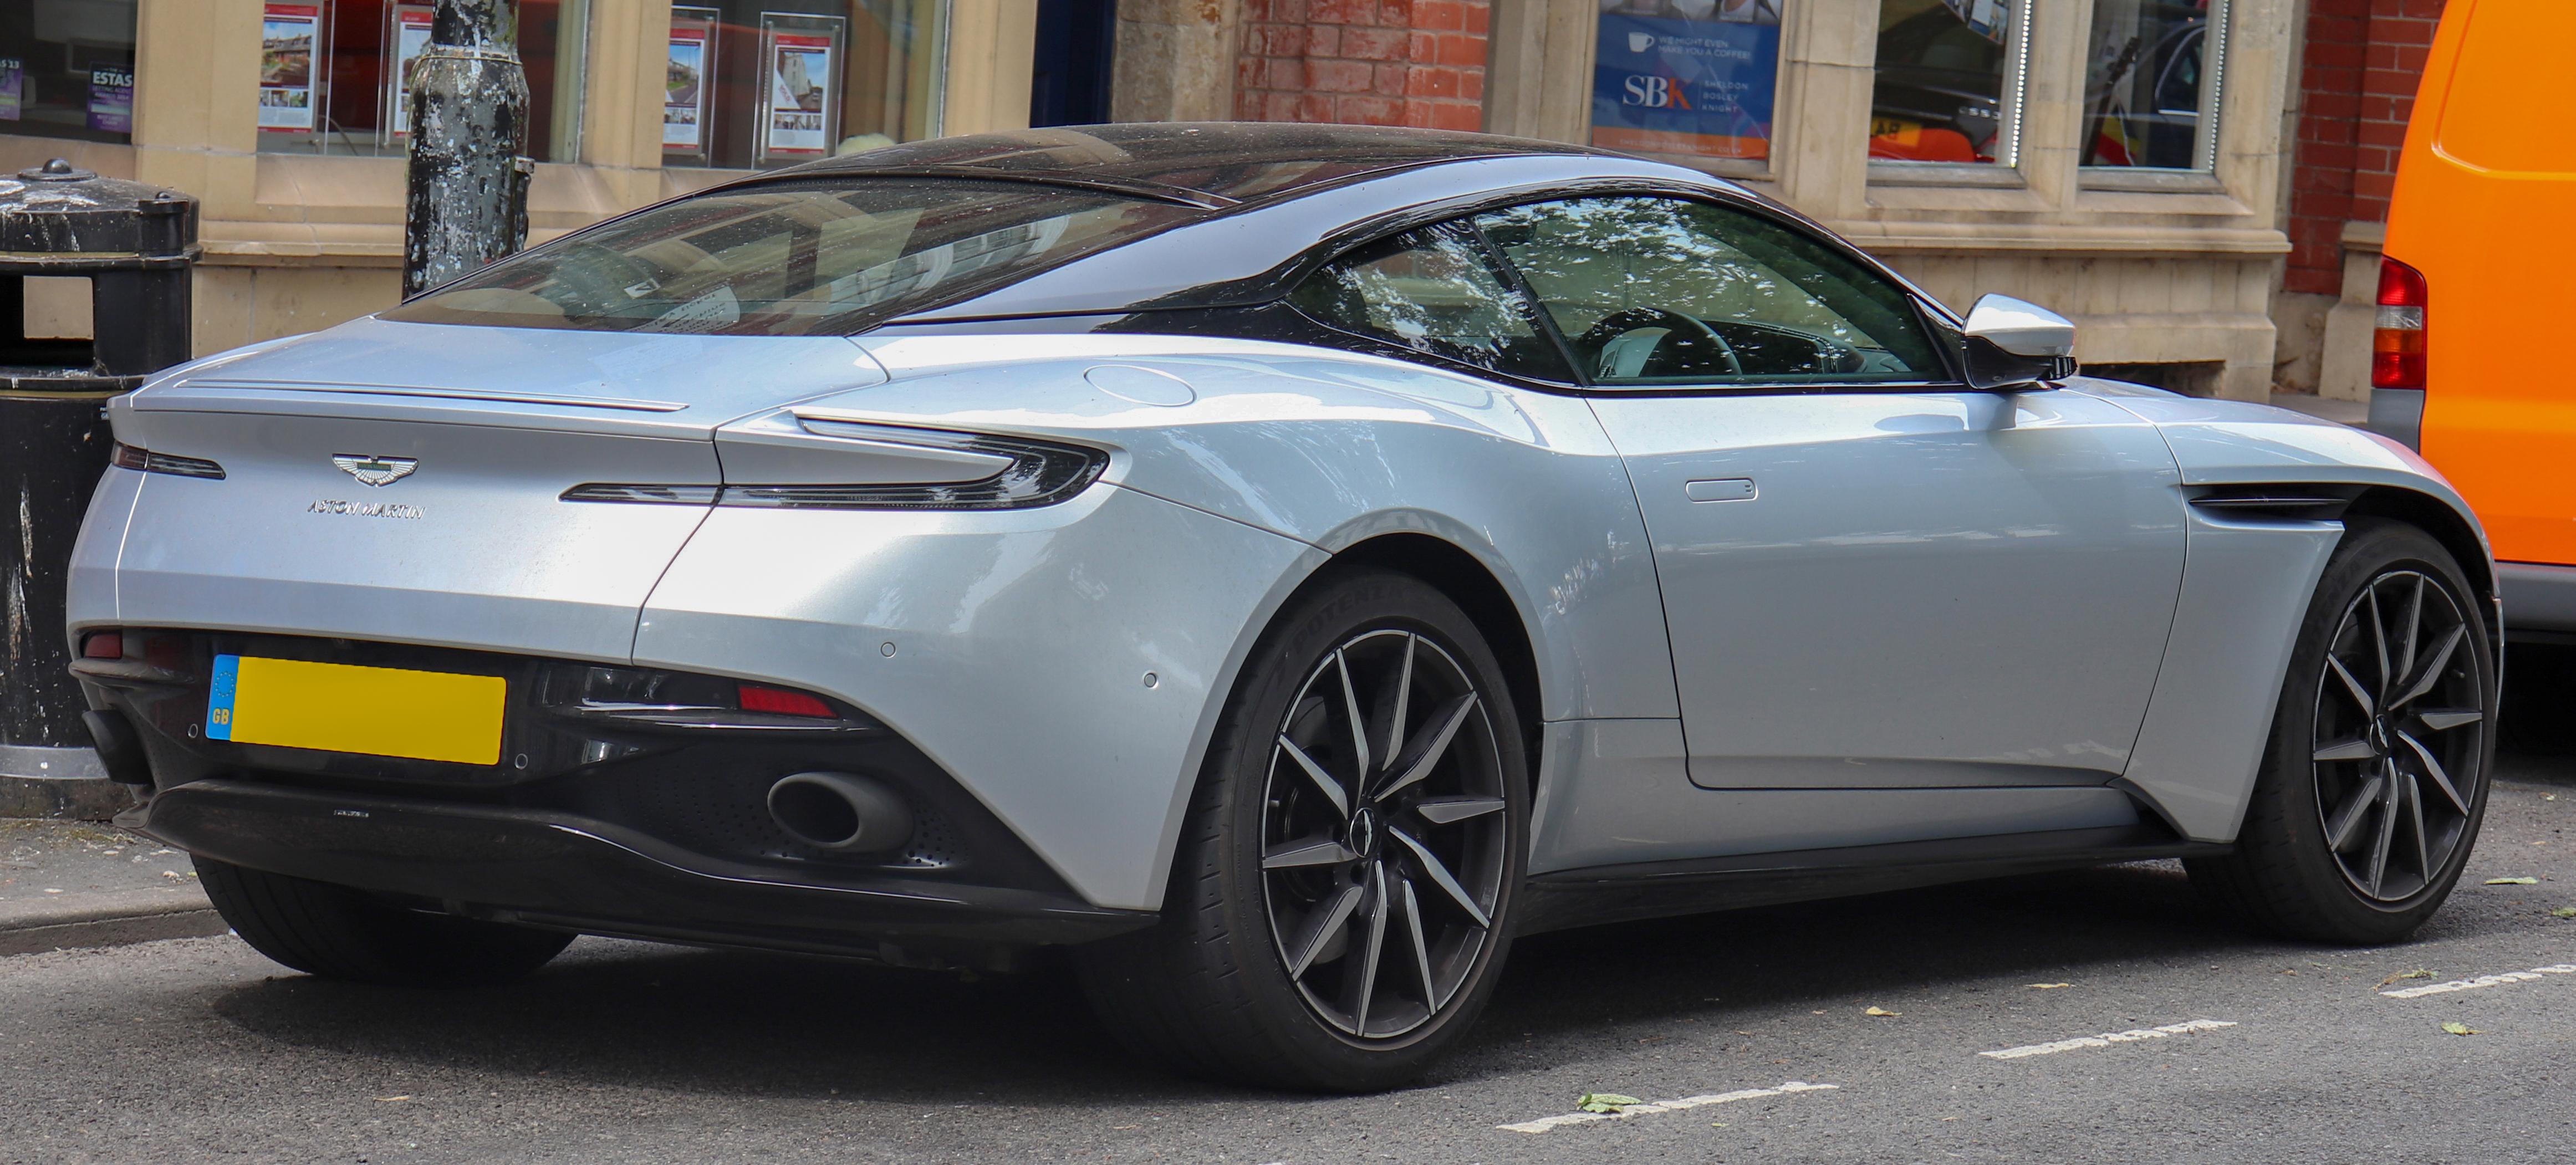 File 2018 Aston Martin Db11 V8 Automatic 4 0 Rear Jpg Wikimedia